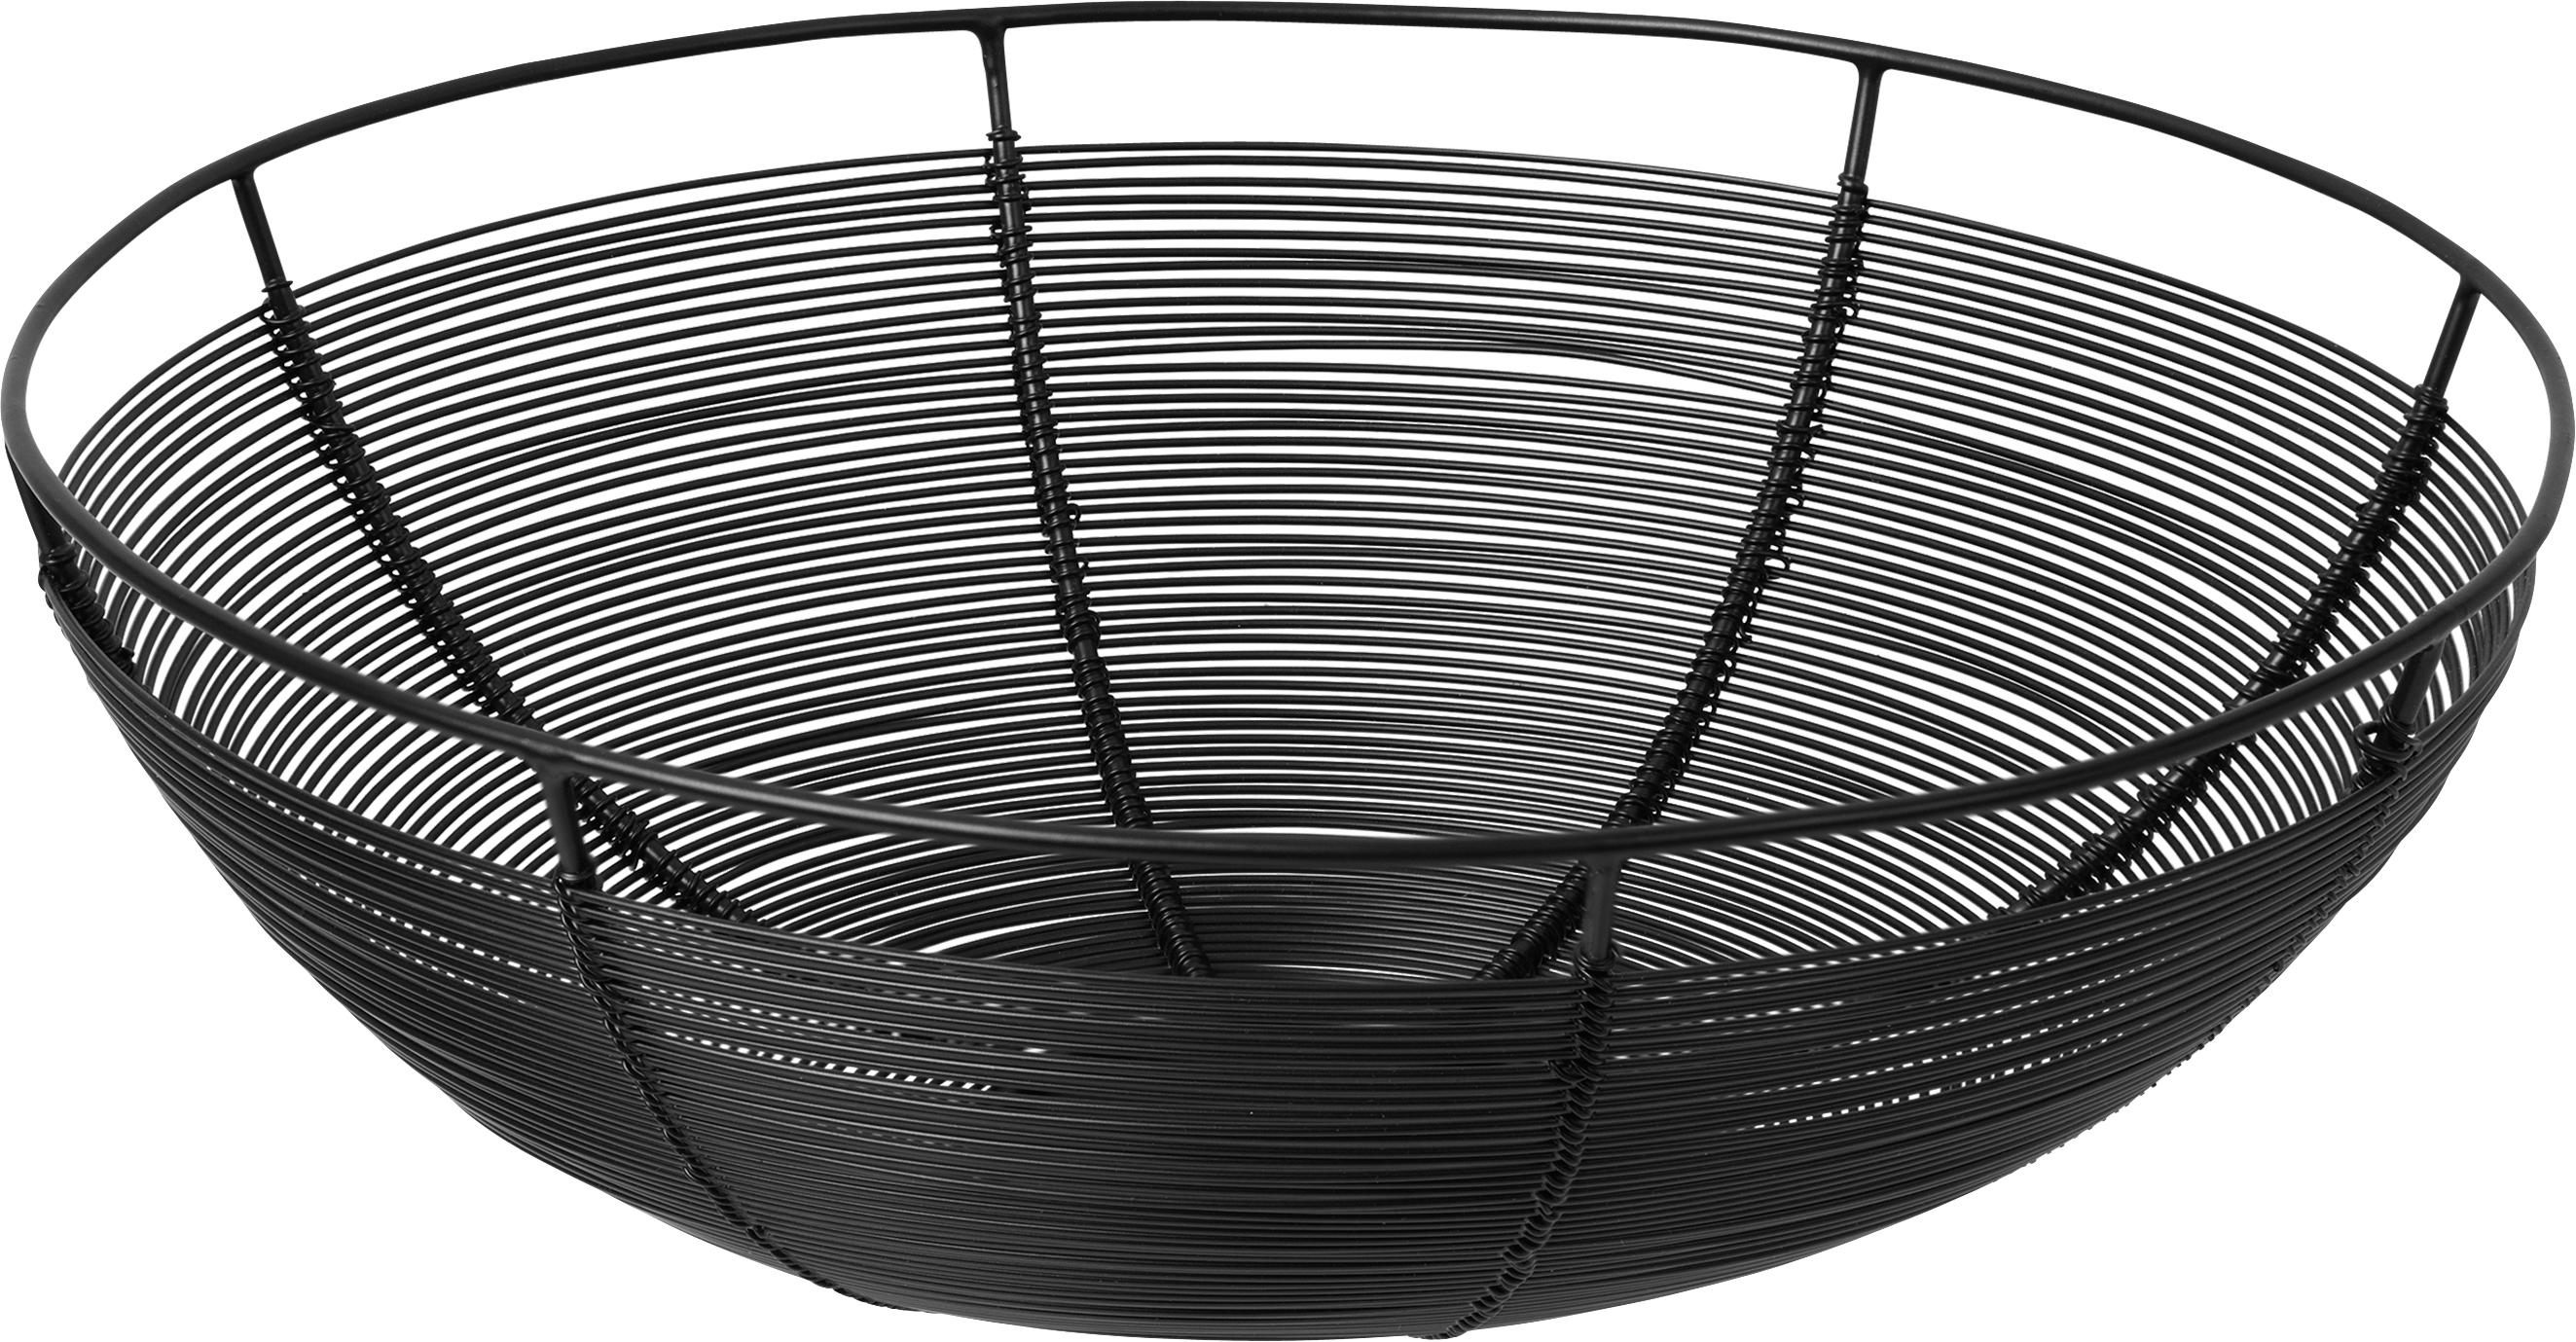 Cestino per pane Nina, Metallo verniciato, Nero, Ø 30 x Alt. 10 cm